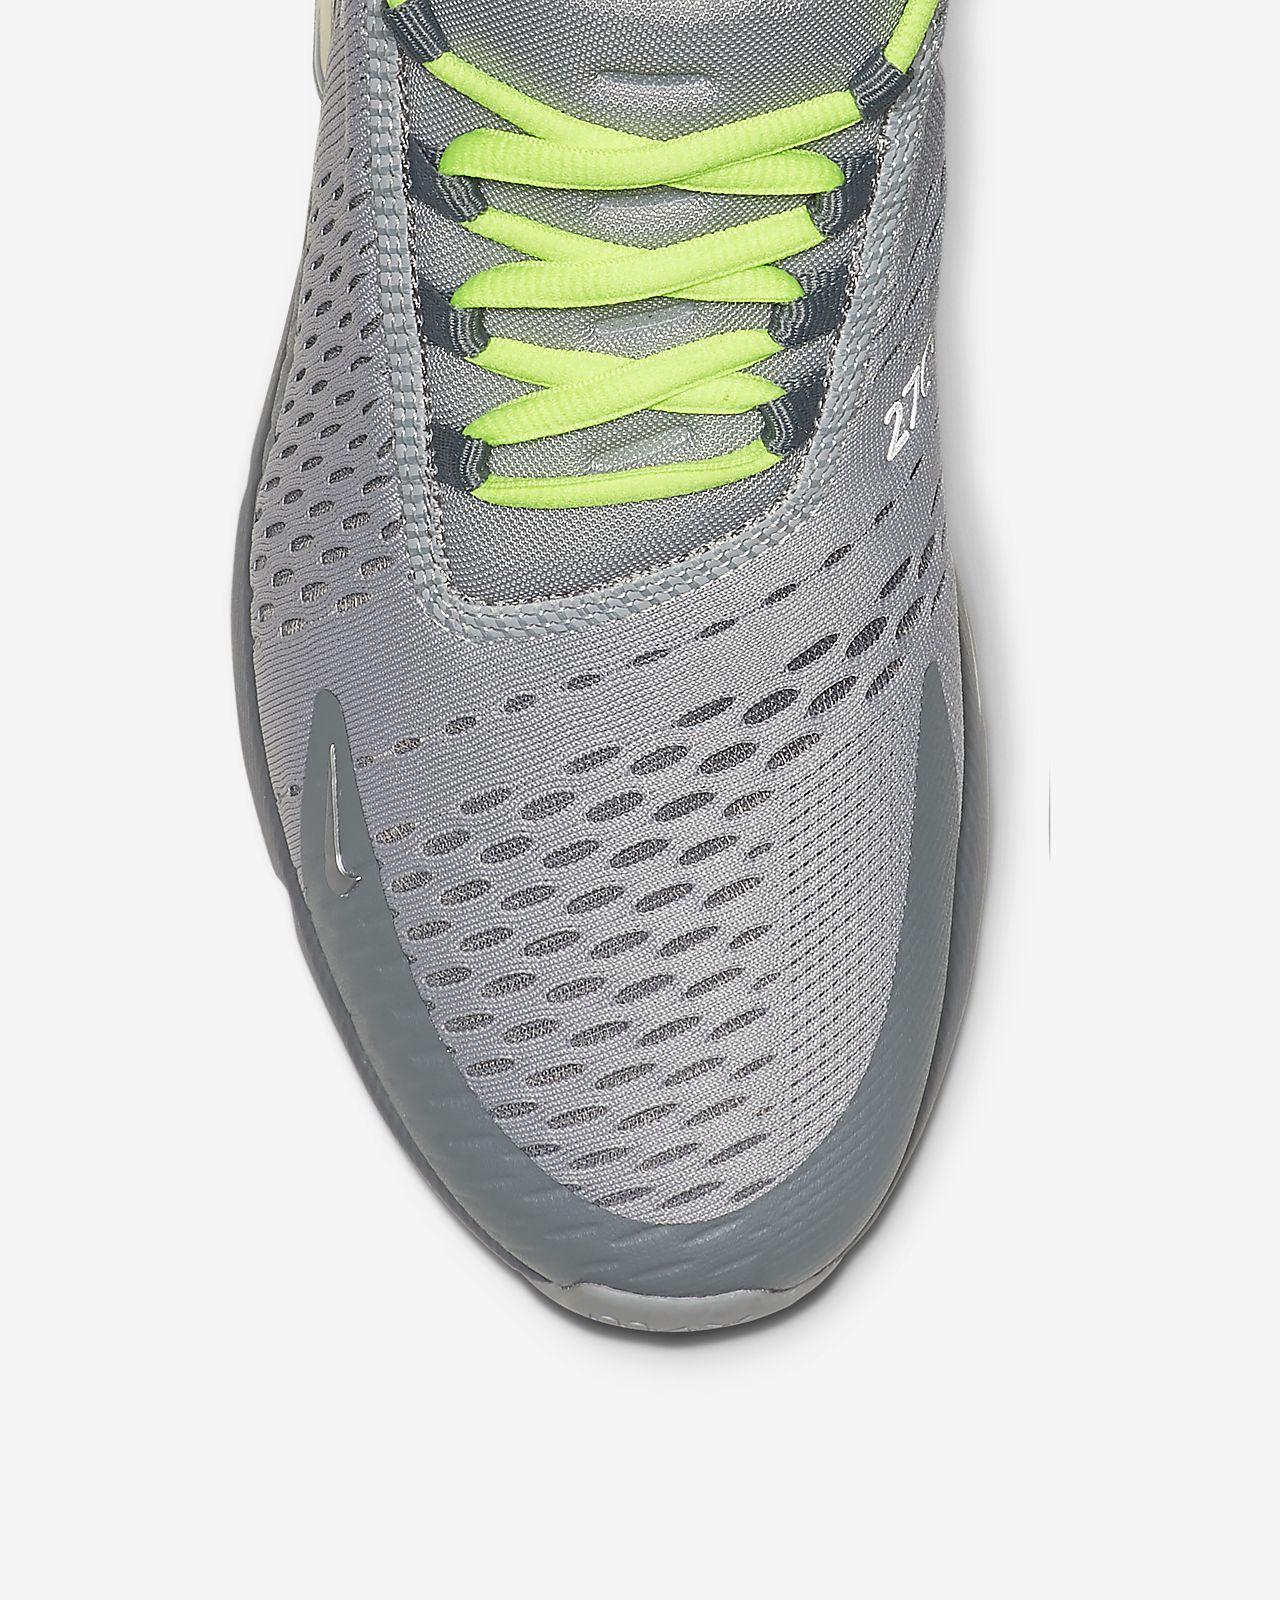 a29feb70f7 Nike Air Max 270 férficipő. Nike.com HU